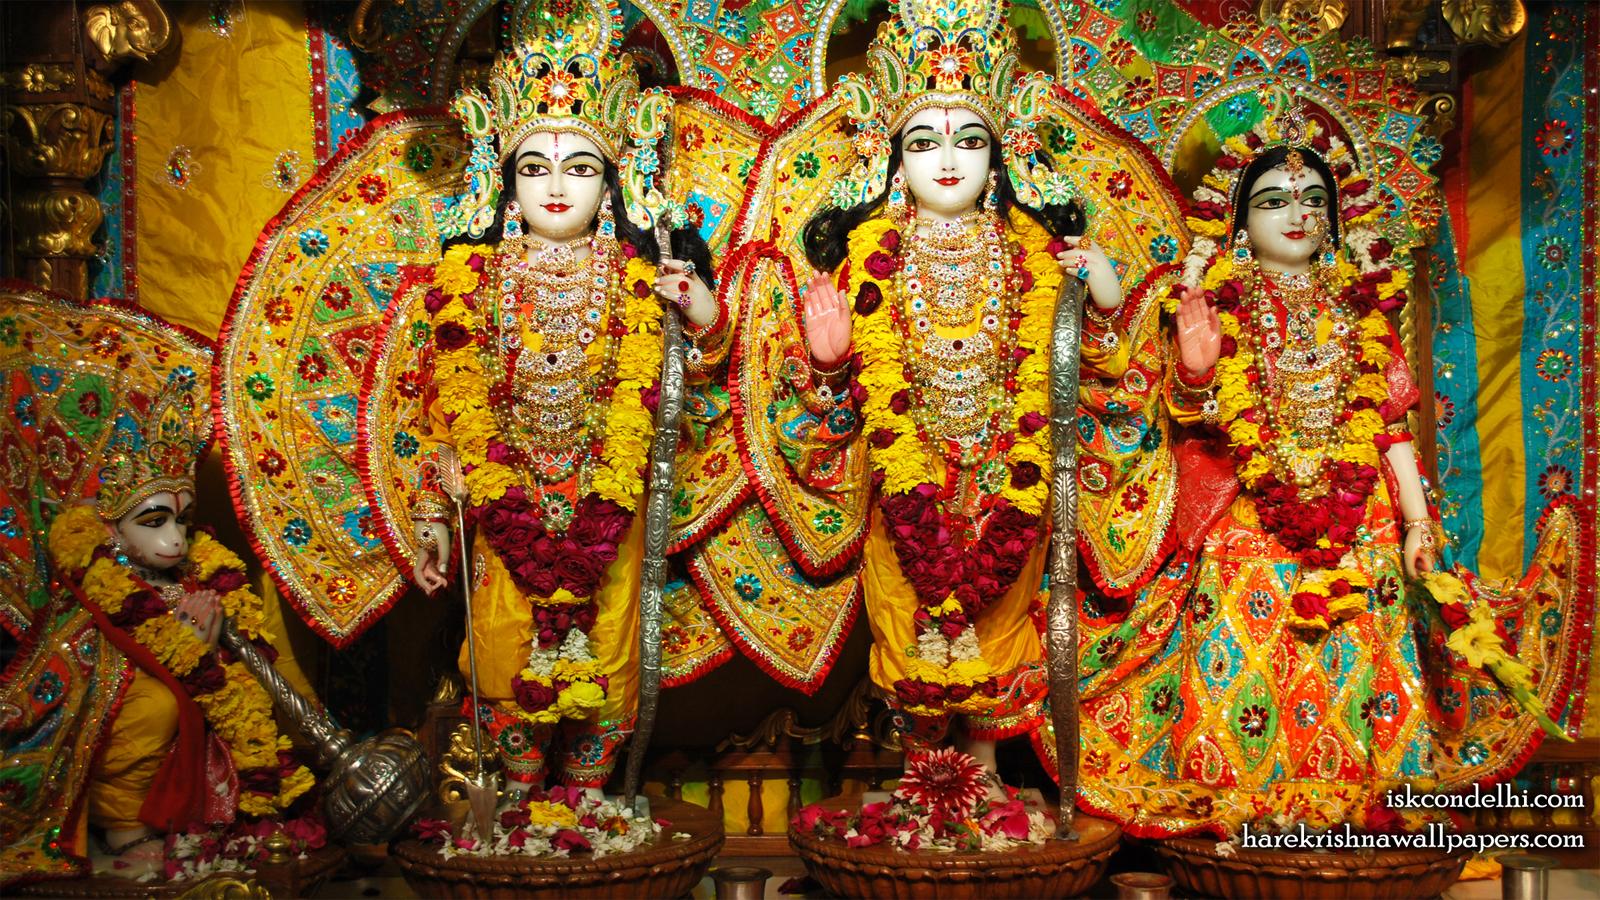 Sri Sri Sita Rama Laxman Hanuman Wallpaper (006) Size 1600x900 Download